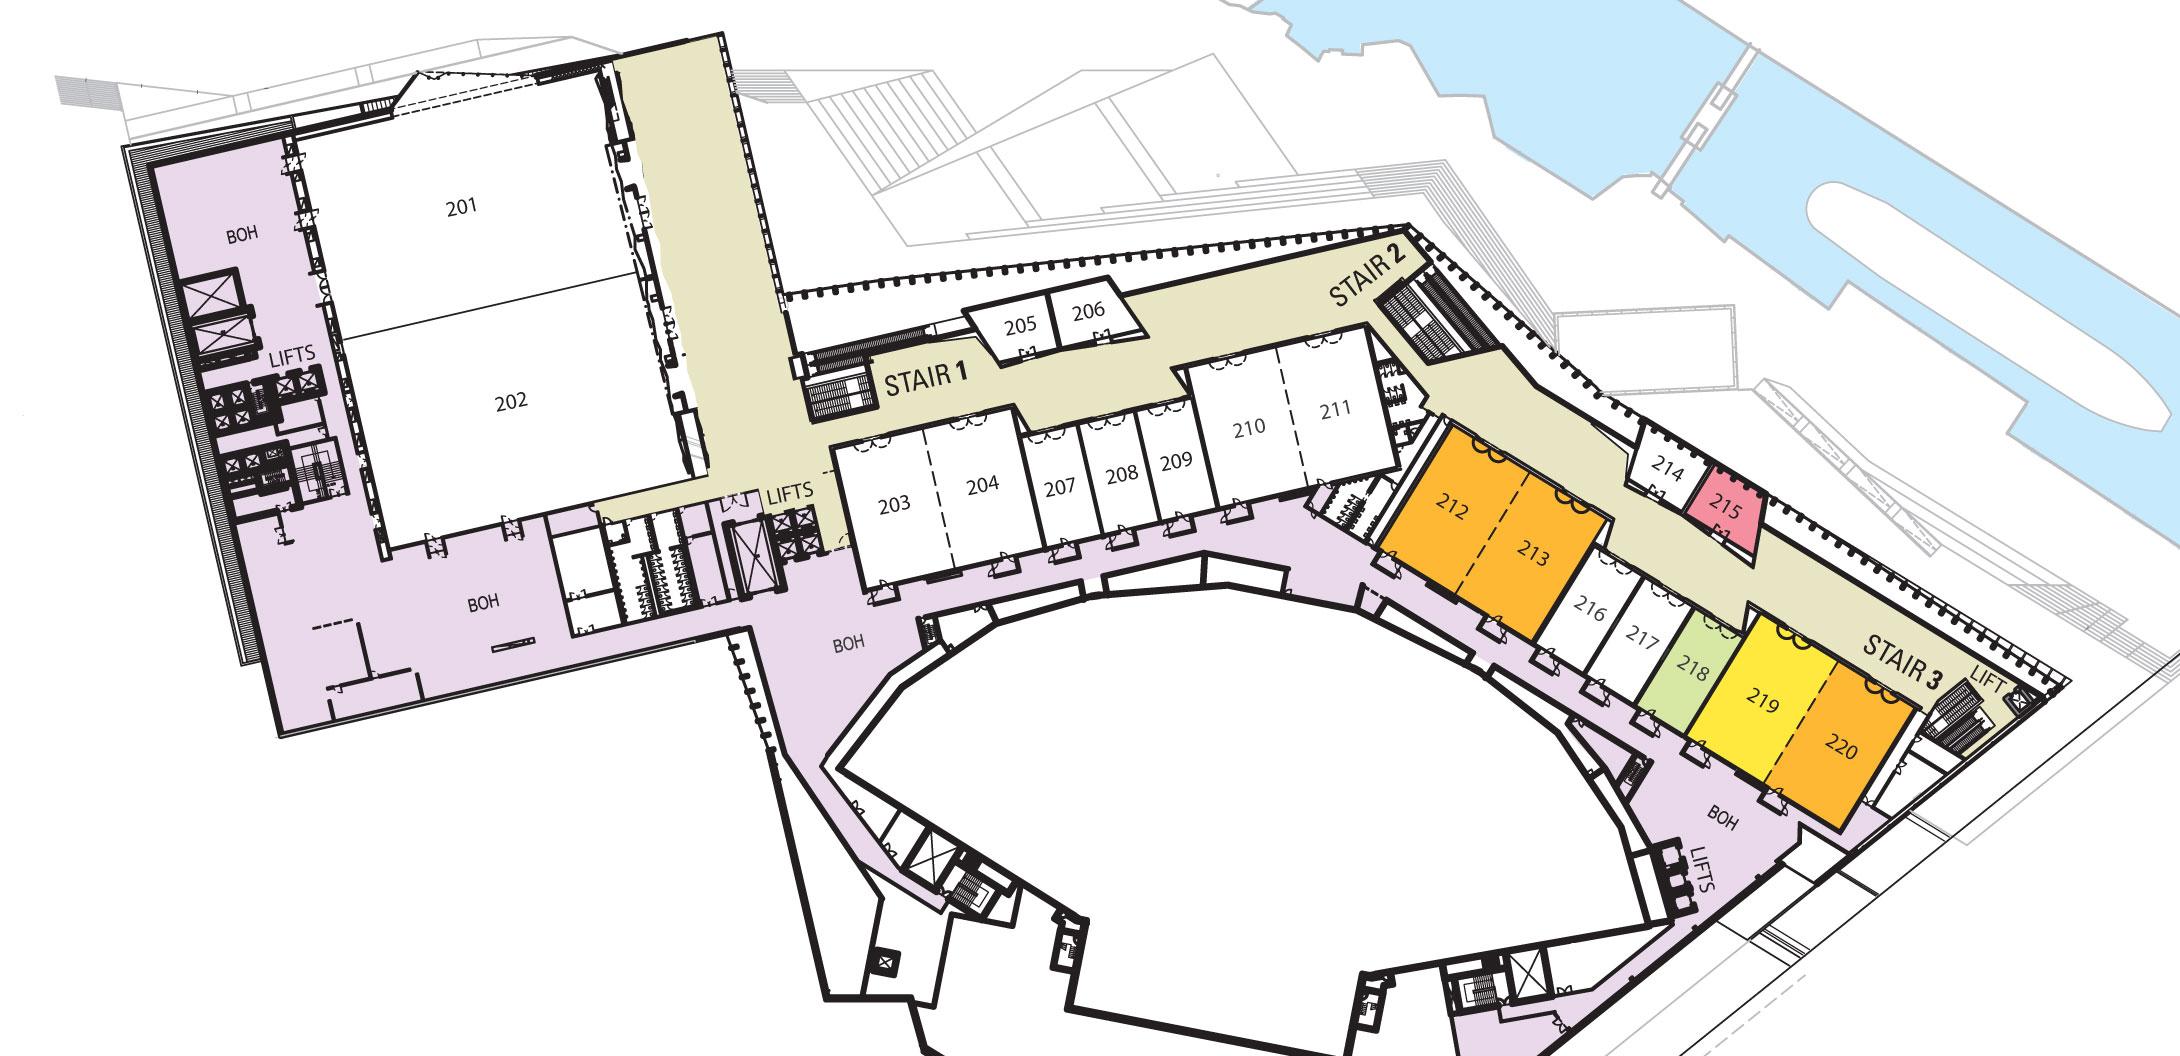 Melbourne Convention and Exhibition Centre Level 2